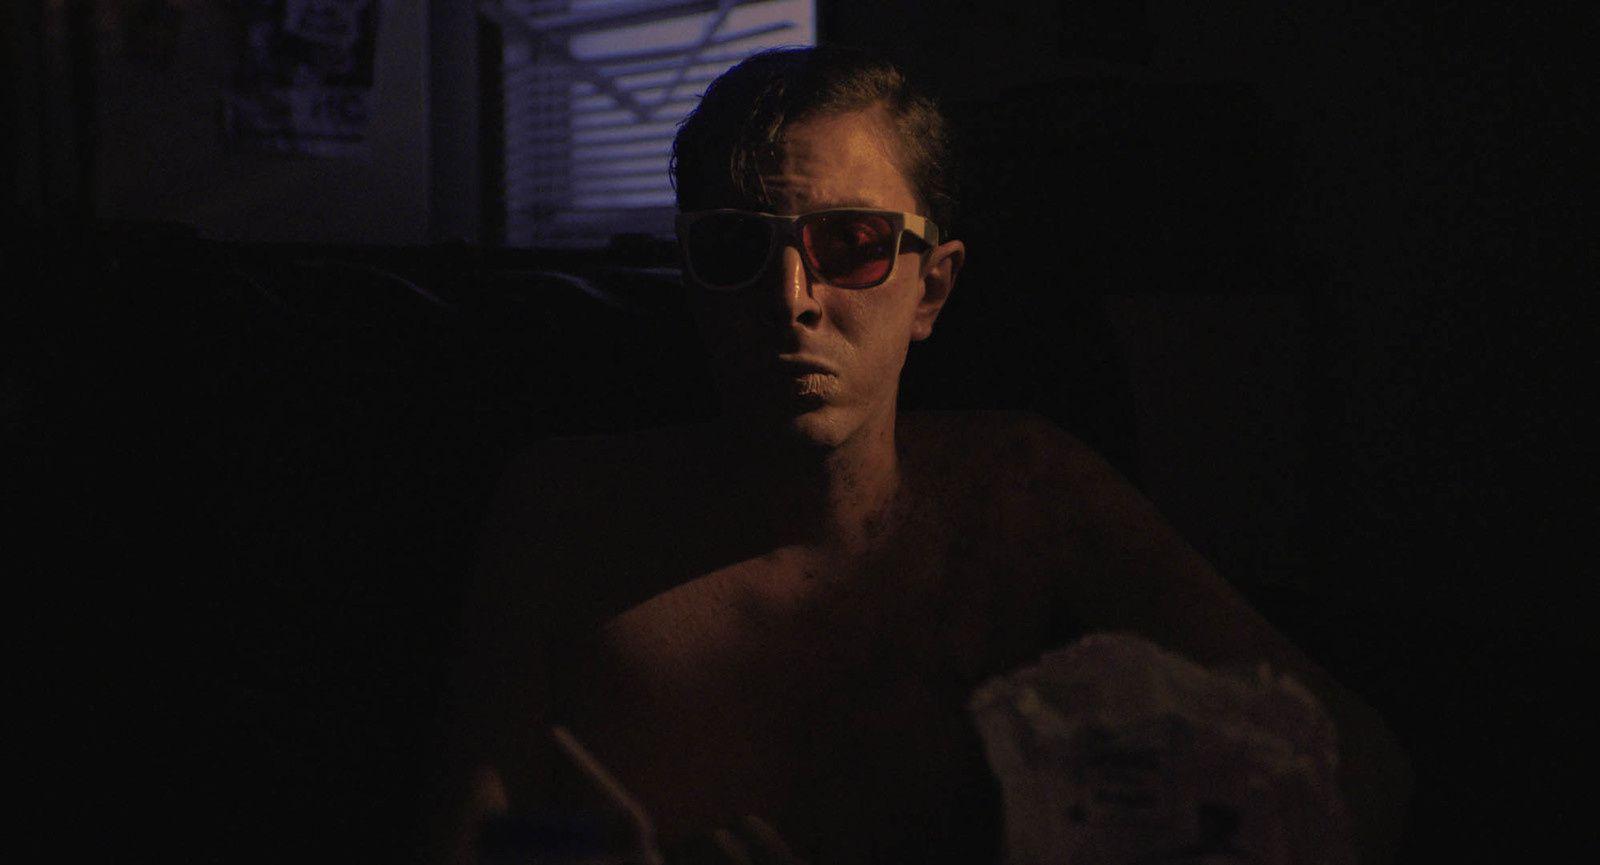 Relaxer (BANDE-ANNONCE) avec Joshua Burge, David Dastmalchian, Andre Hyland